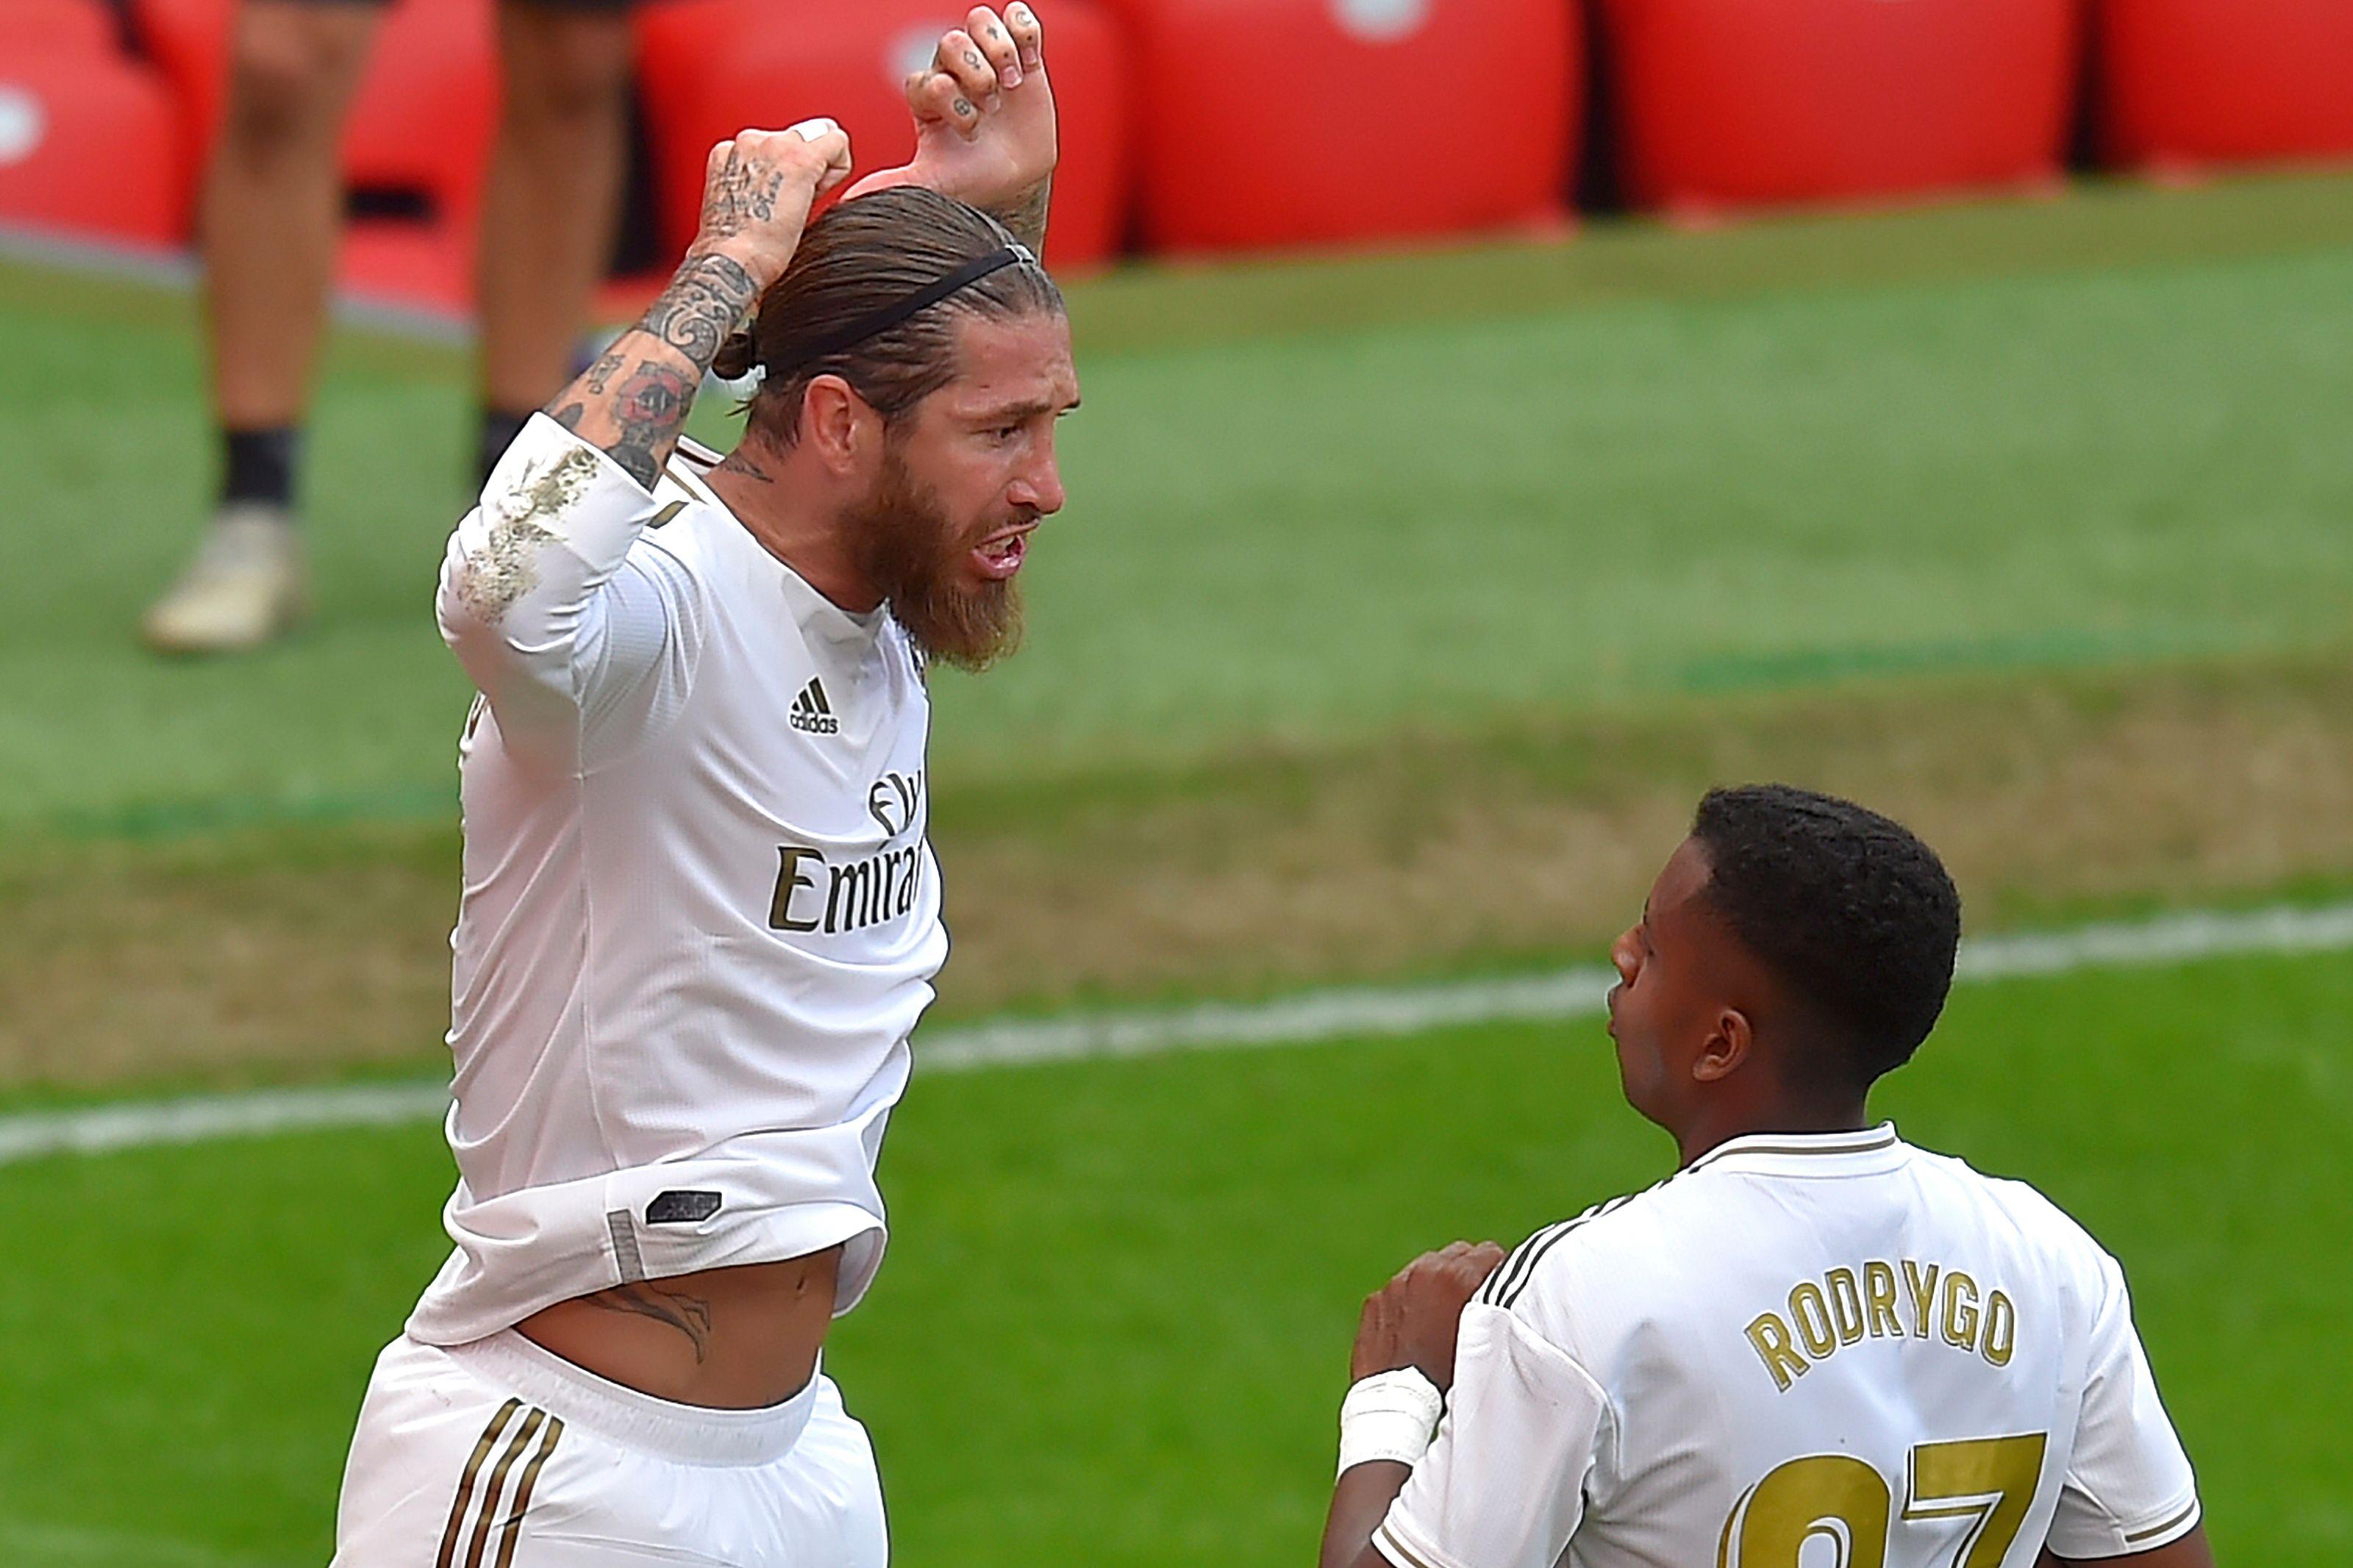 Real Madrid Vs Alaves Live Stream Tv Channel Start Time How To Watch La Liga 2020 Fri July 10 Masslive Com